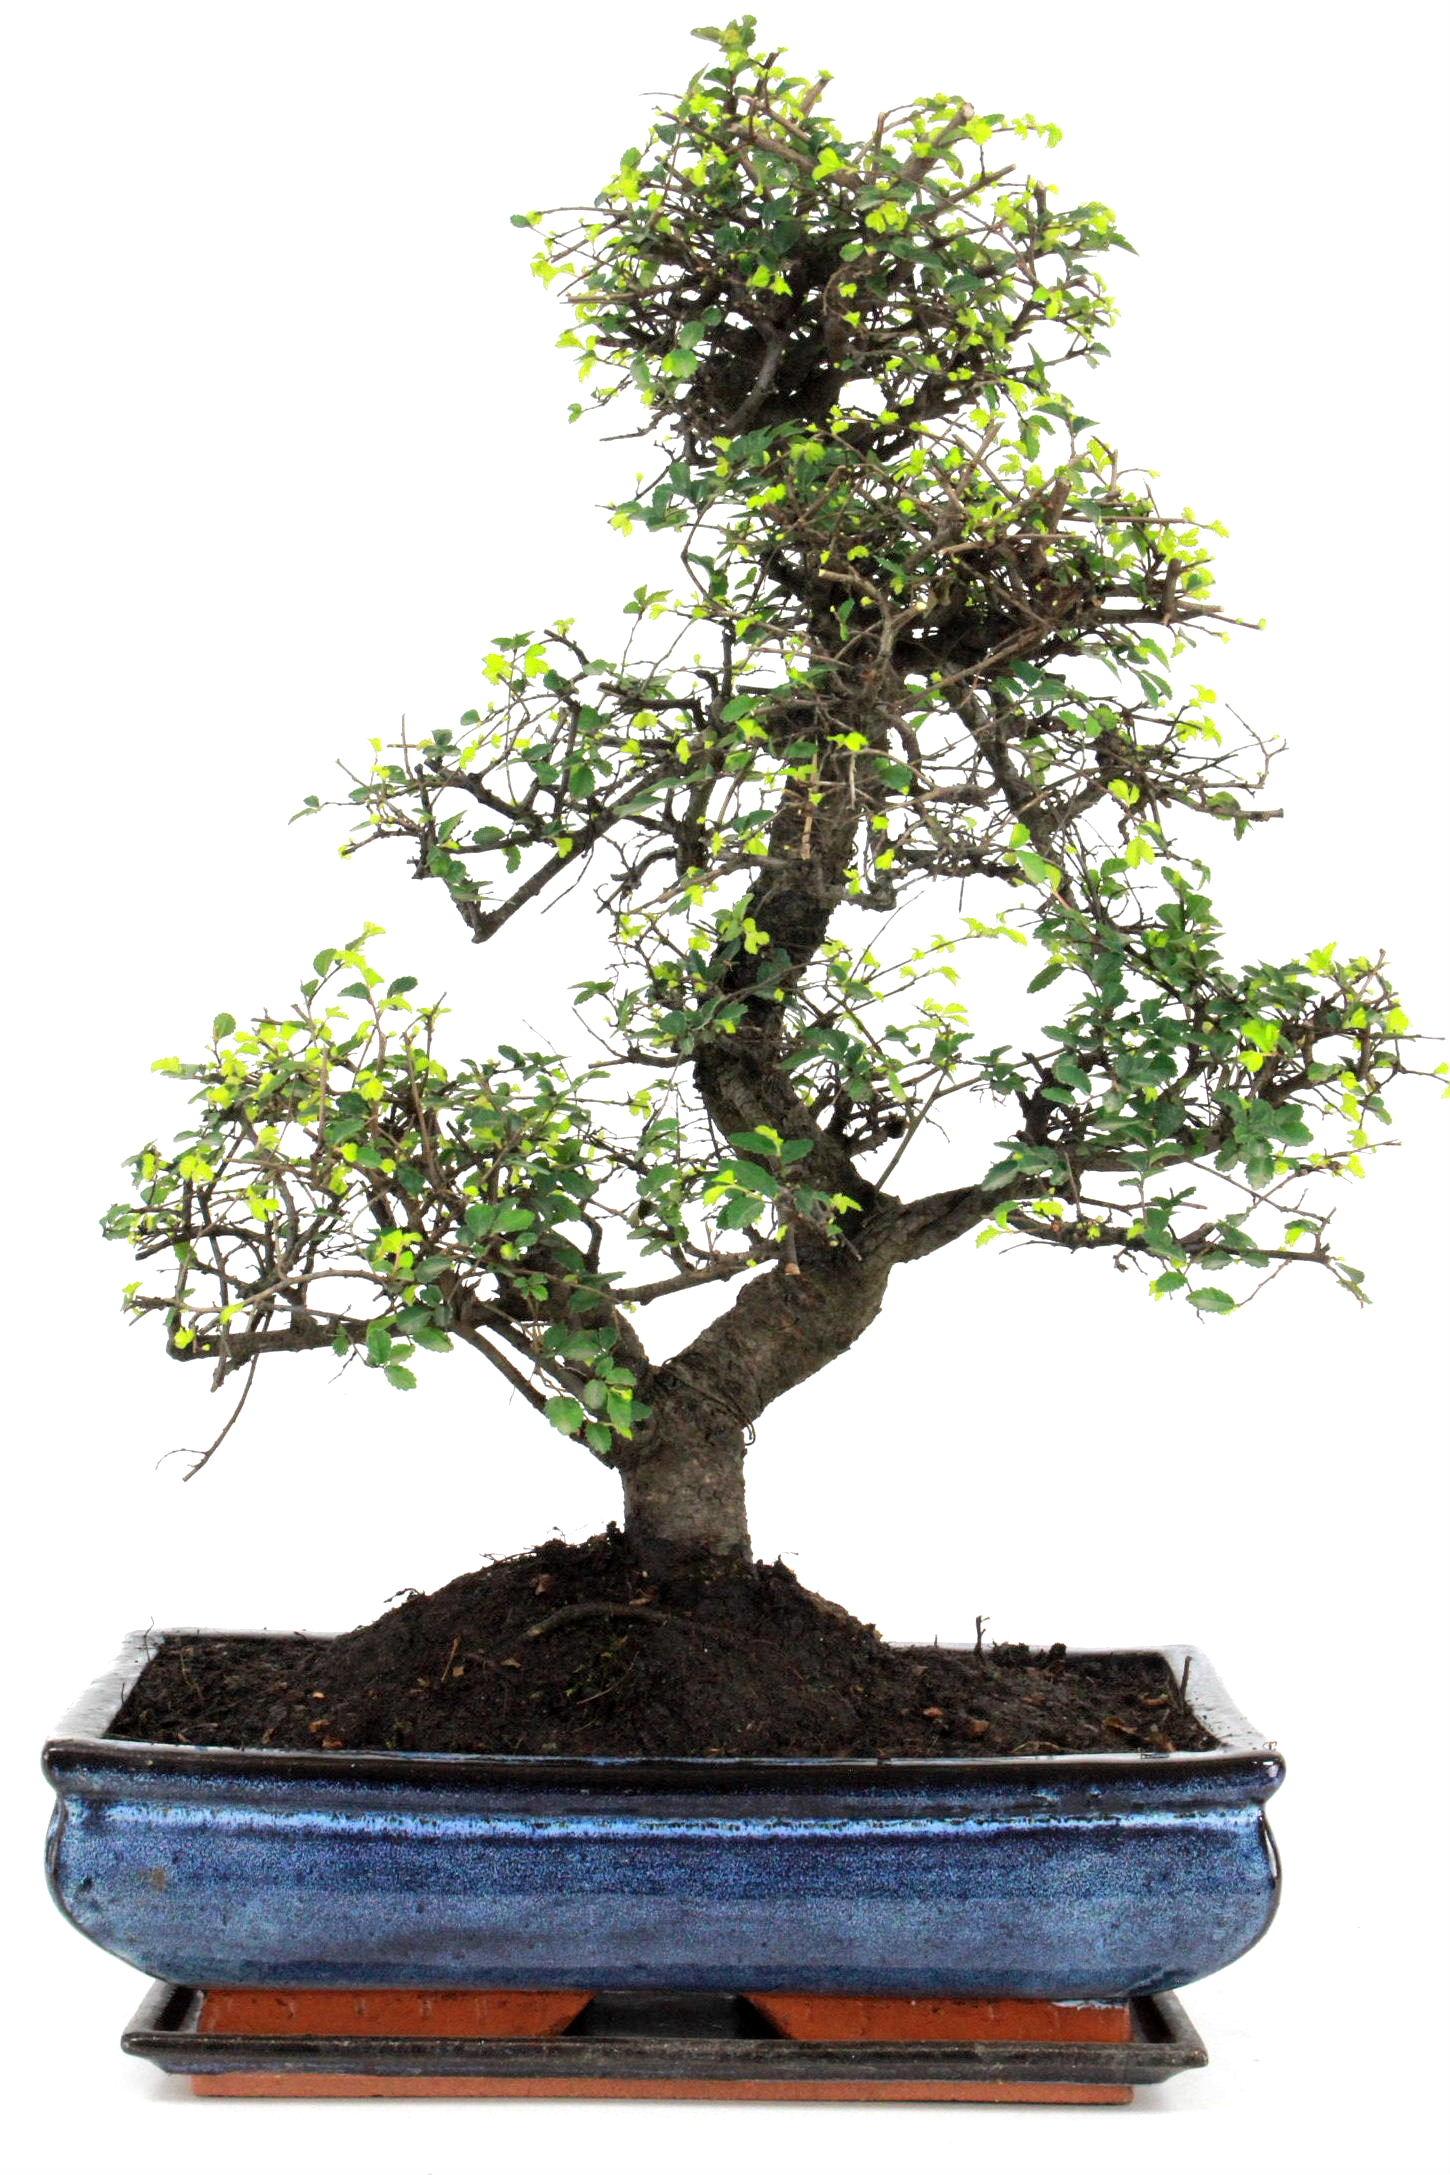 bonsai chinesische ulme 55 cm 344 bei oyaki bonsai kaufen. Black Bedroom Furniture Sets. Home Design Ideas